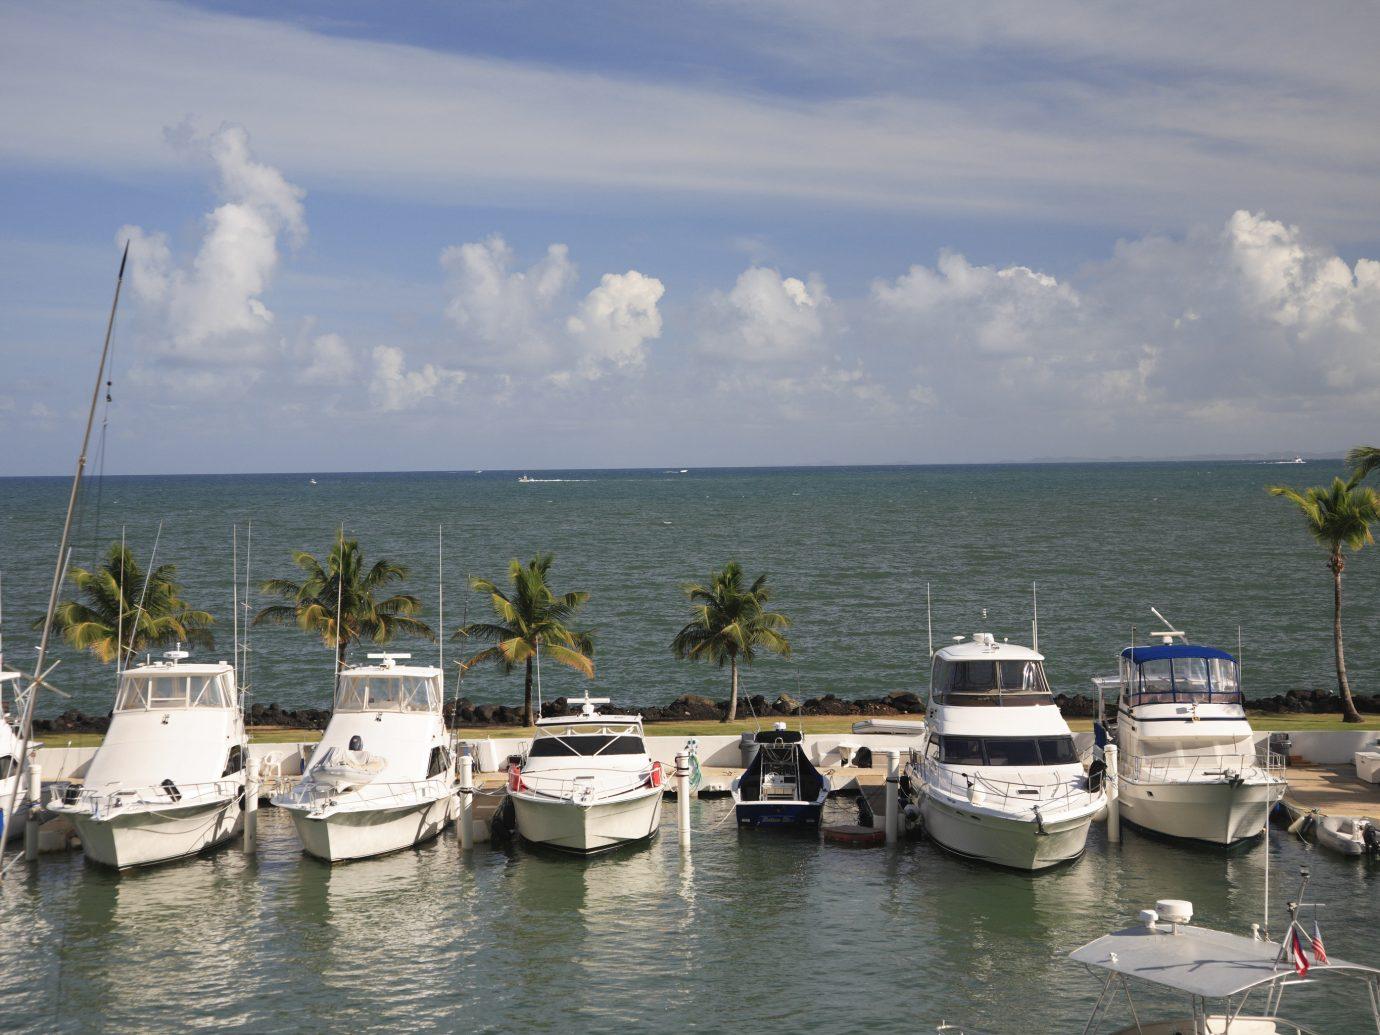 Hotels water sky Boat outdoor Sea vehicle scene marina vacation Harbor dock bay boating Coast passenger ship watercraft